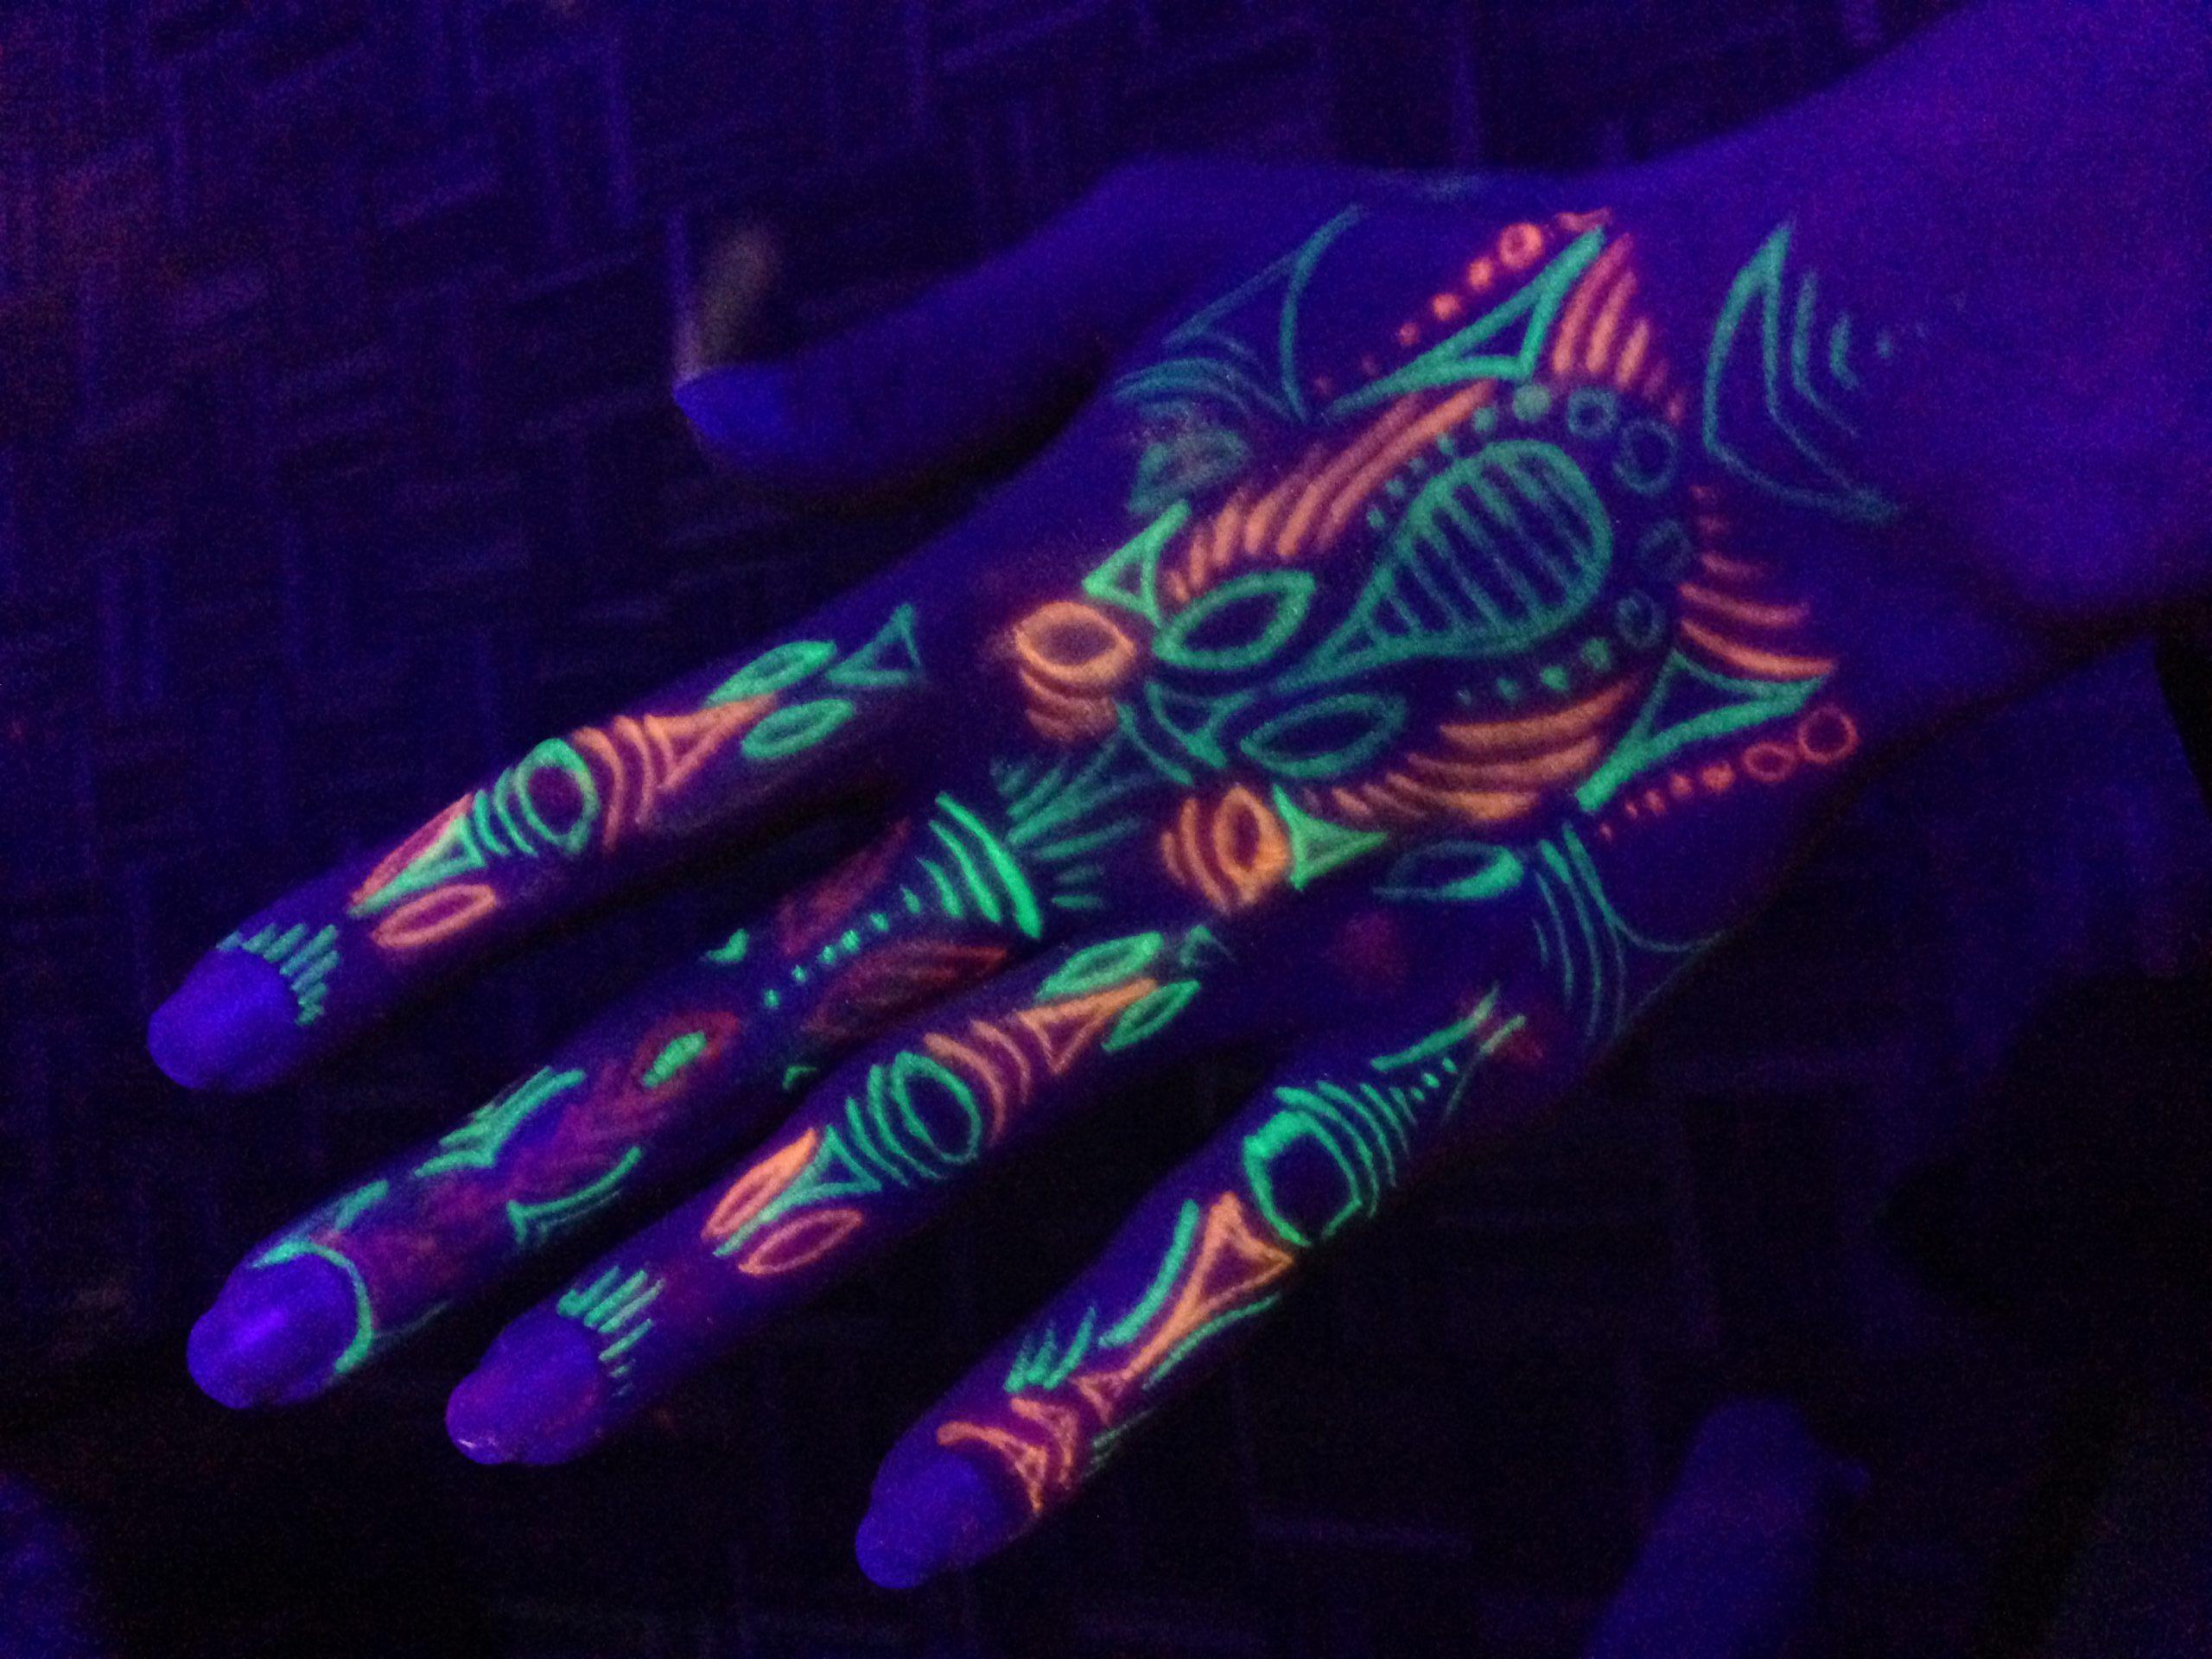 Neonhand